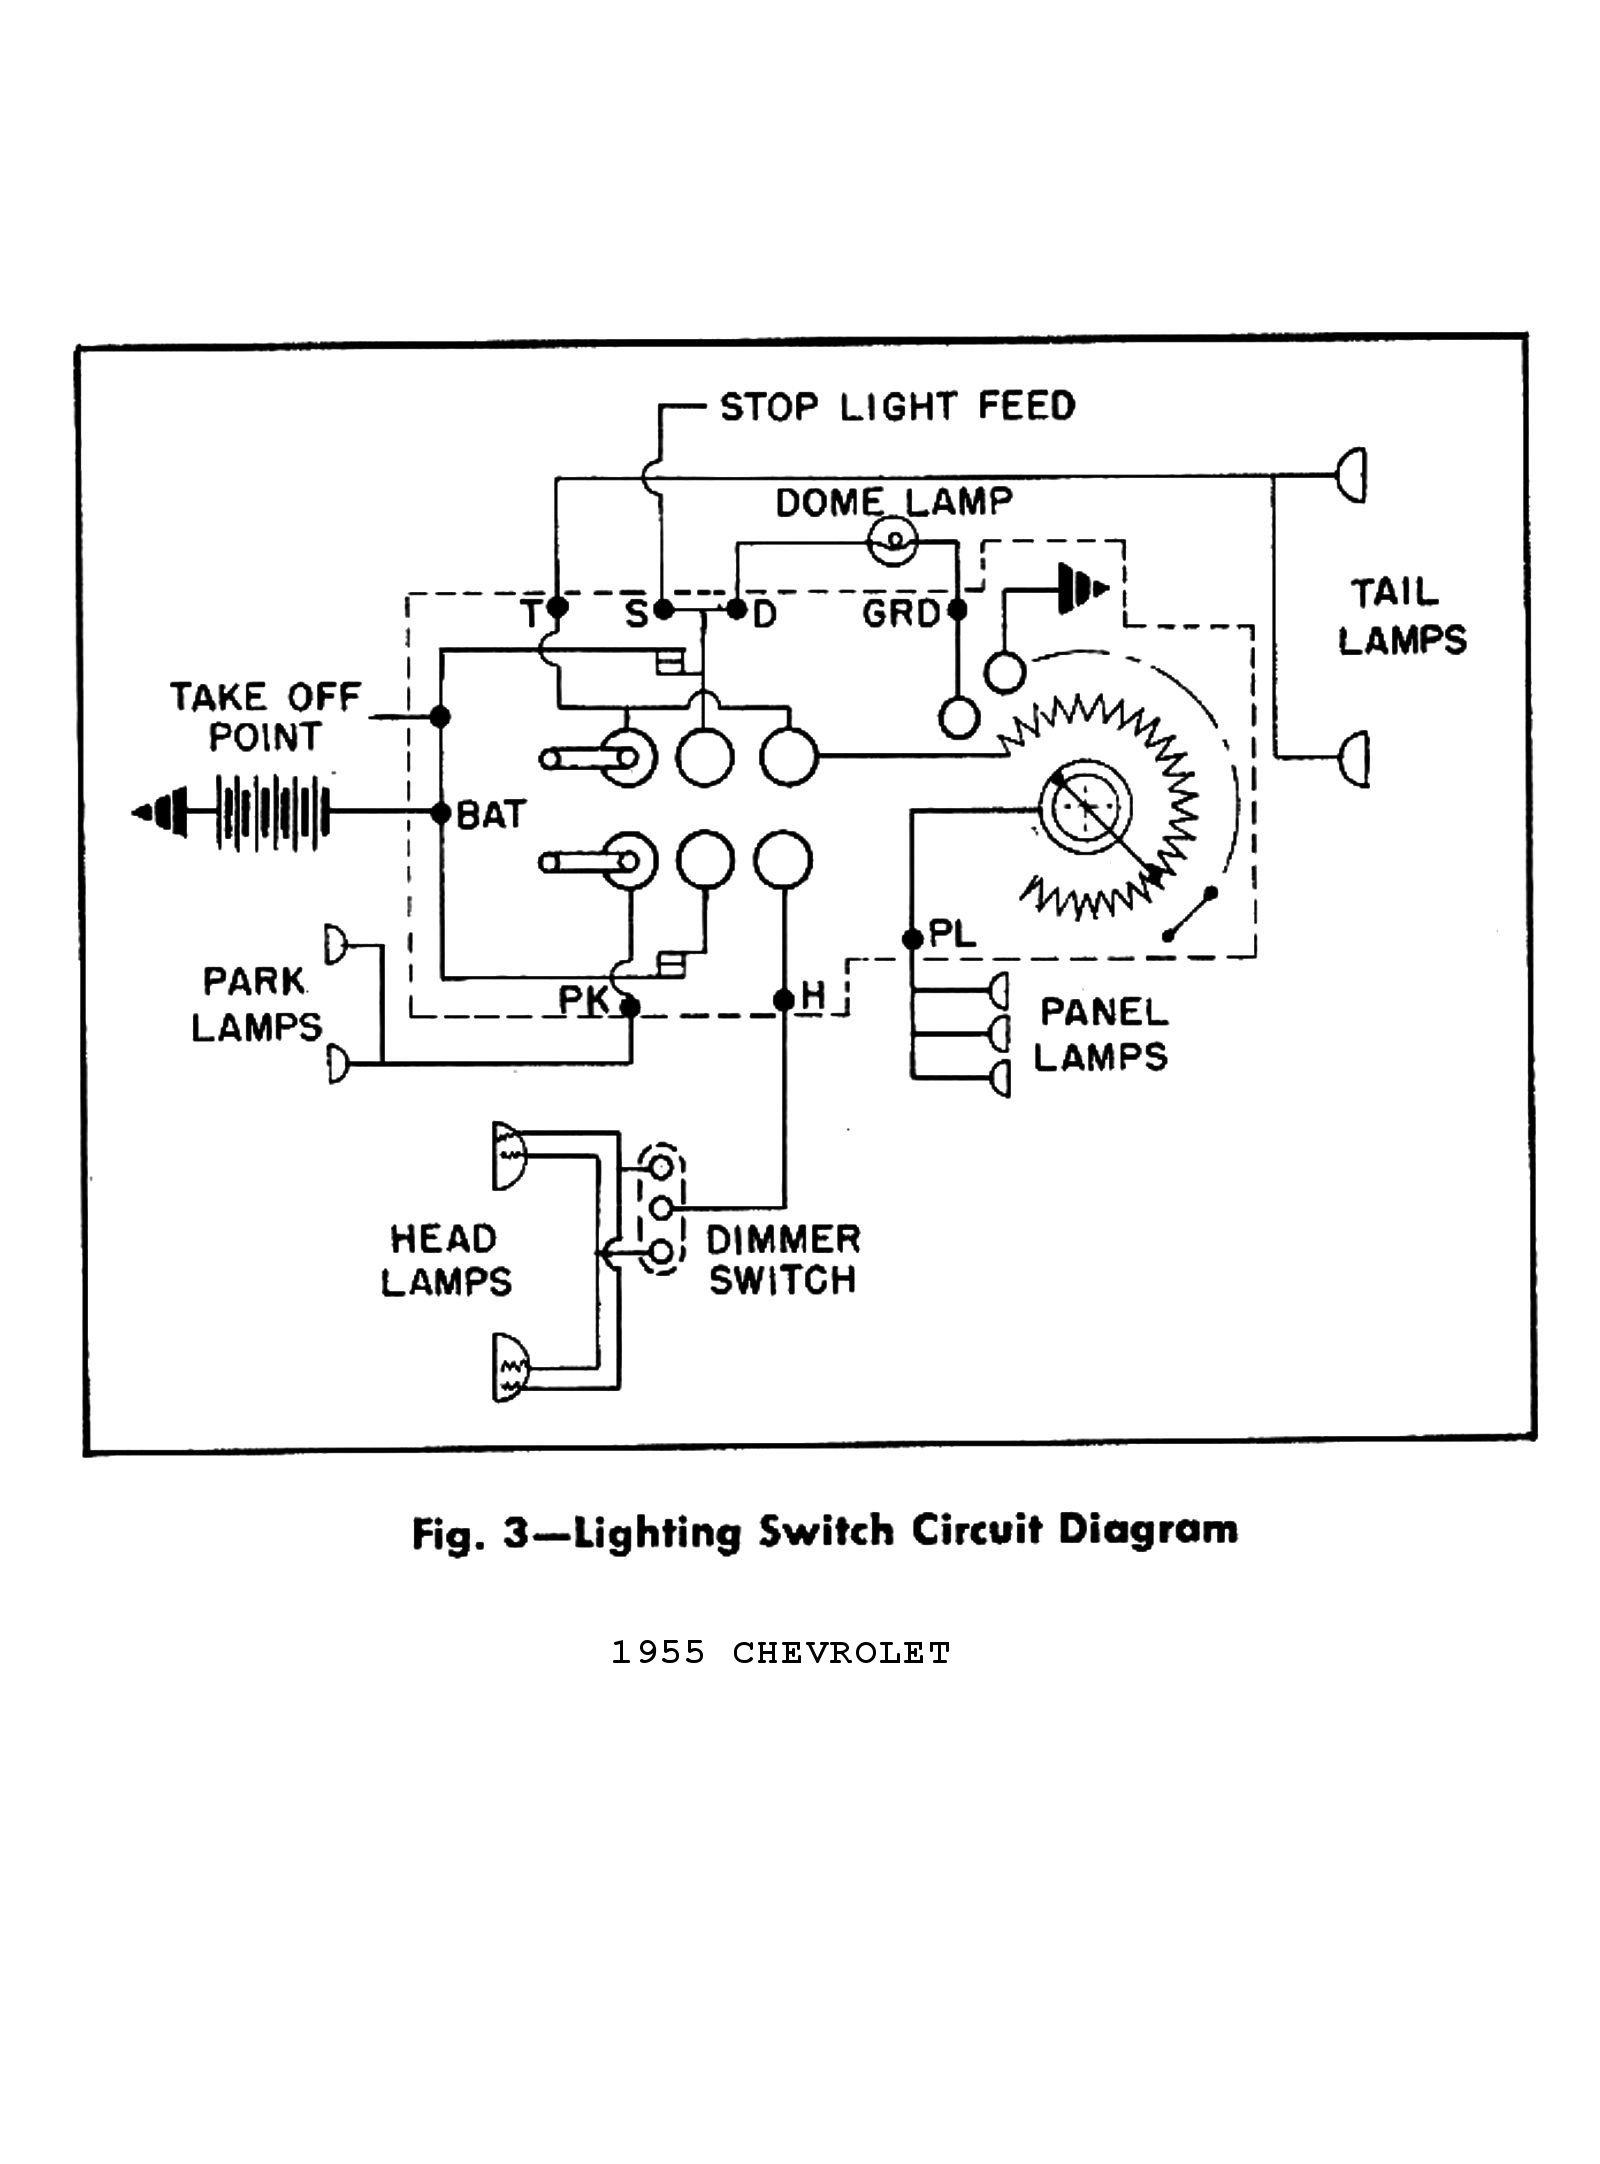 57 Bel Air Ignition Switch Wiring Diagram Wiring Diagram View A View A Zaafran It